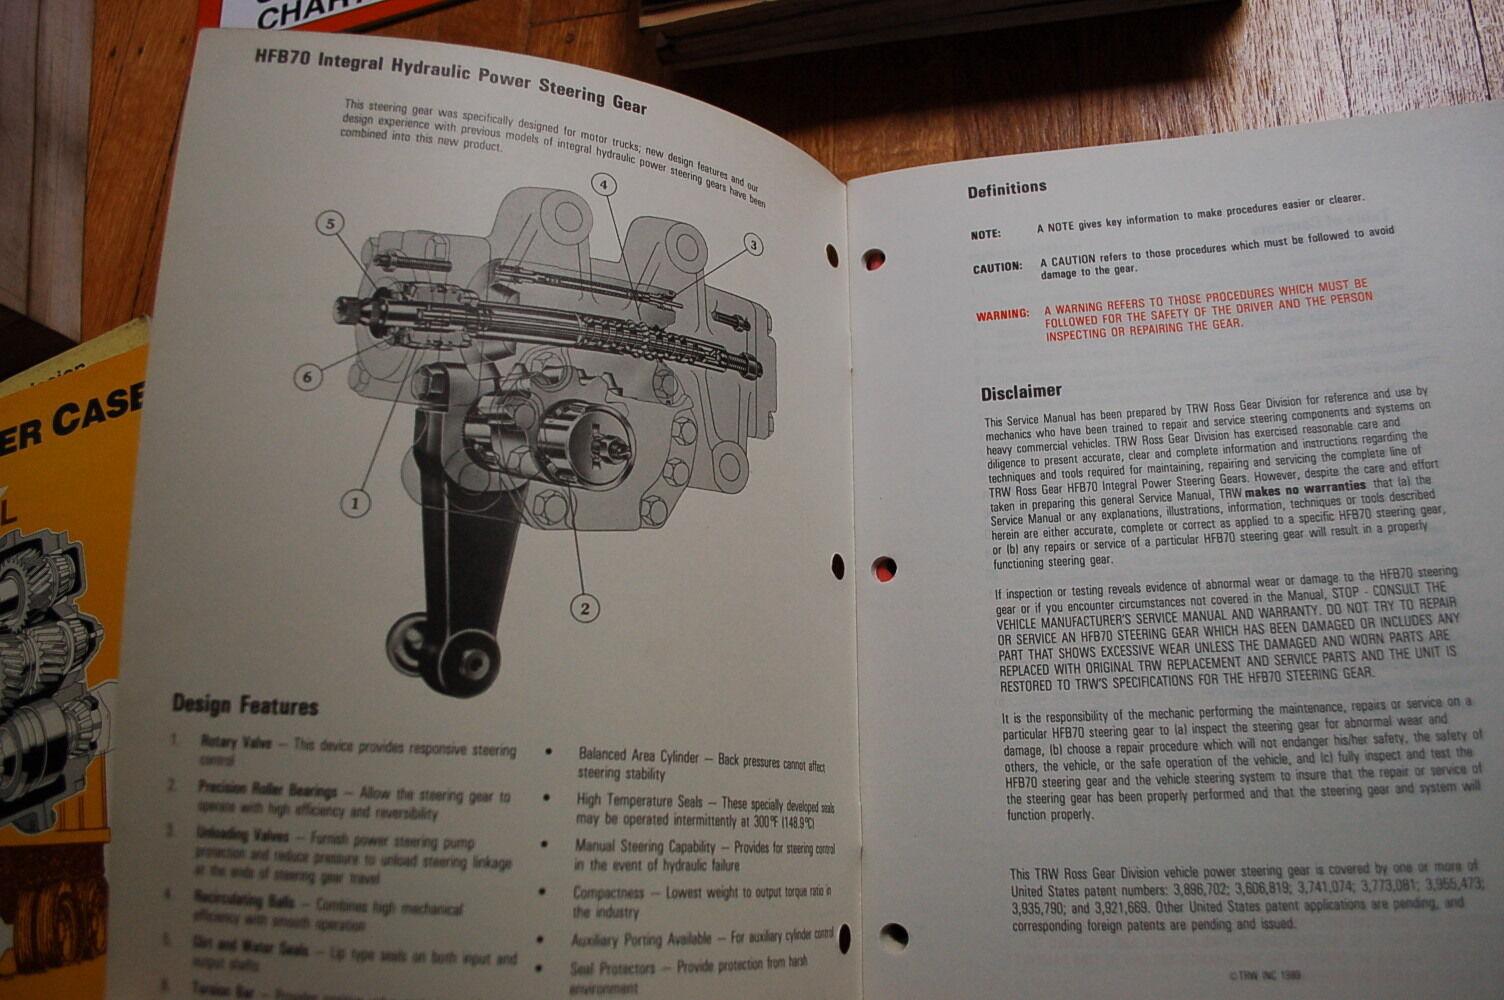 Mack Service Manual Ford Wiring Diagrams 3 2008 Focus Diagram Emprendedor 1970 Truck Array Manuals Www Topsimages Com Rh